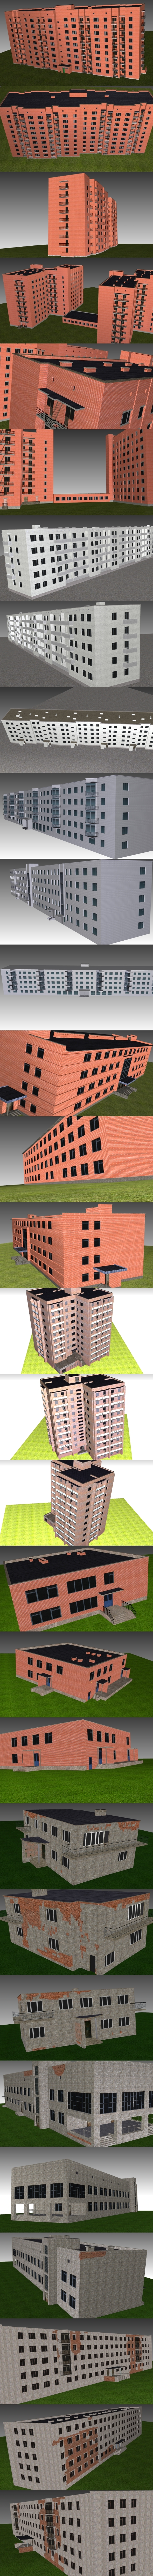 Building Super Package - 3DOcean Item for Sale